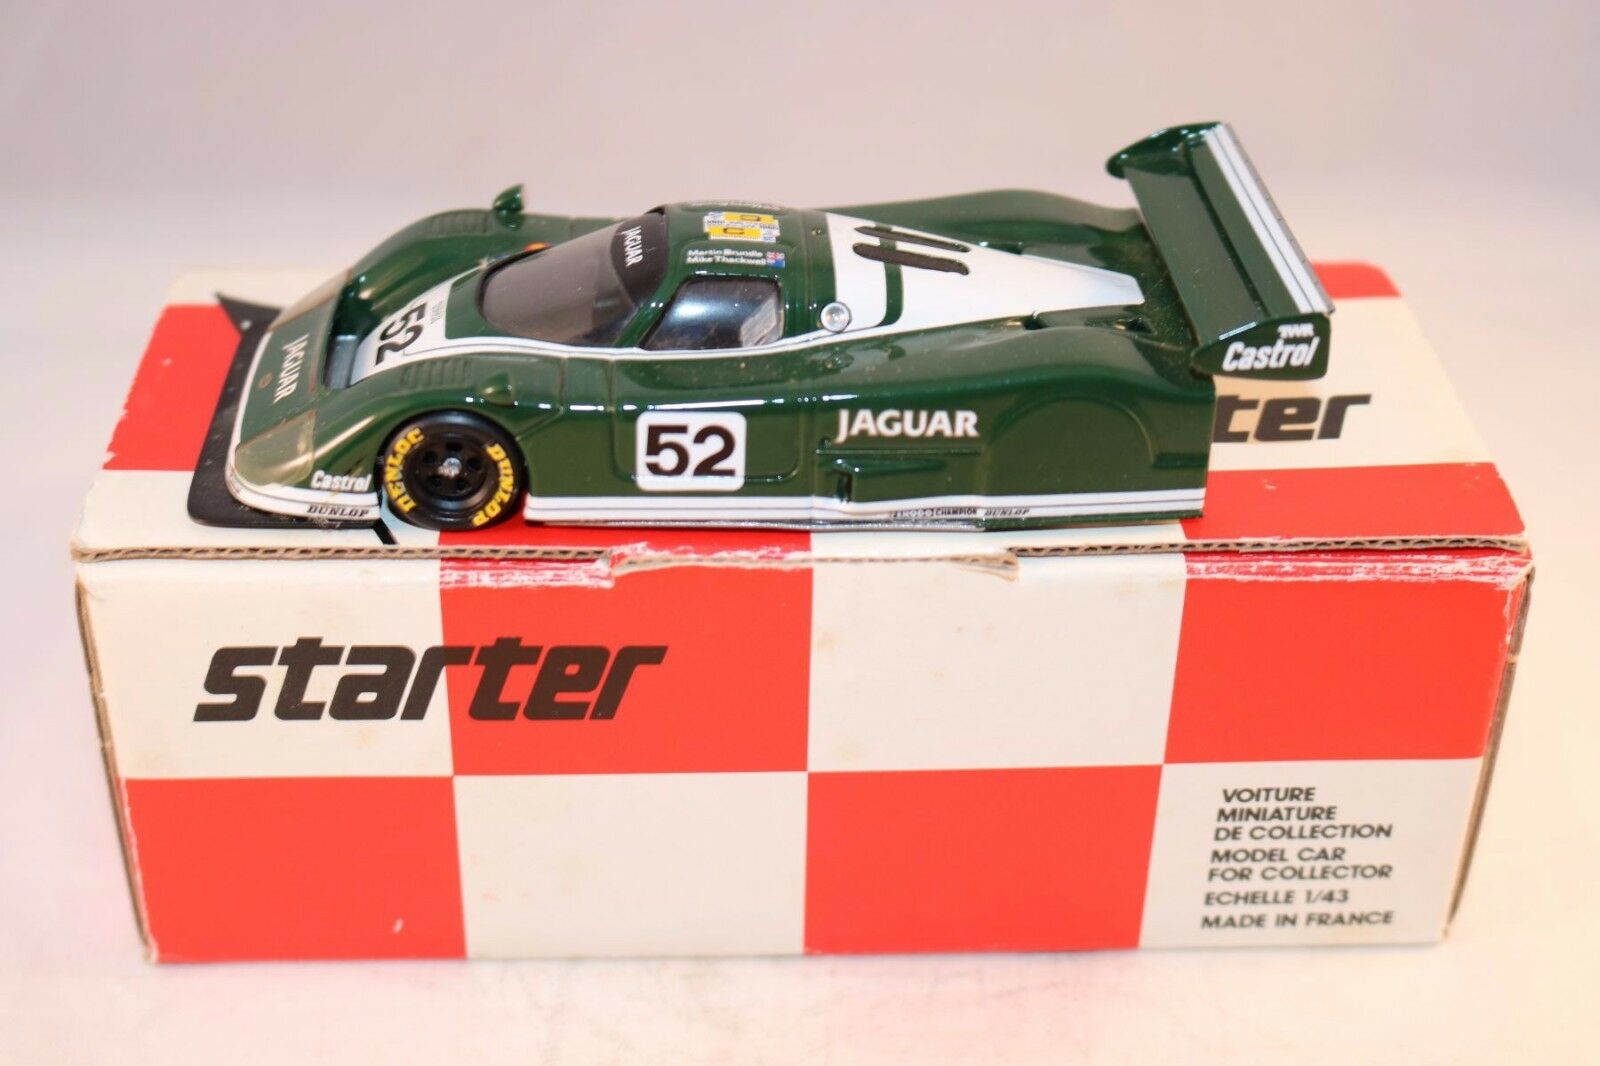 Estrellater o o o Amr Jaguar xjr 6 Metal Rep 480 Andre M. RUF muy poco frecuente b09